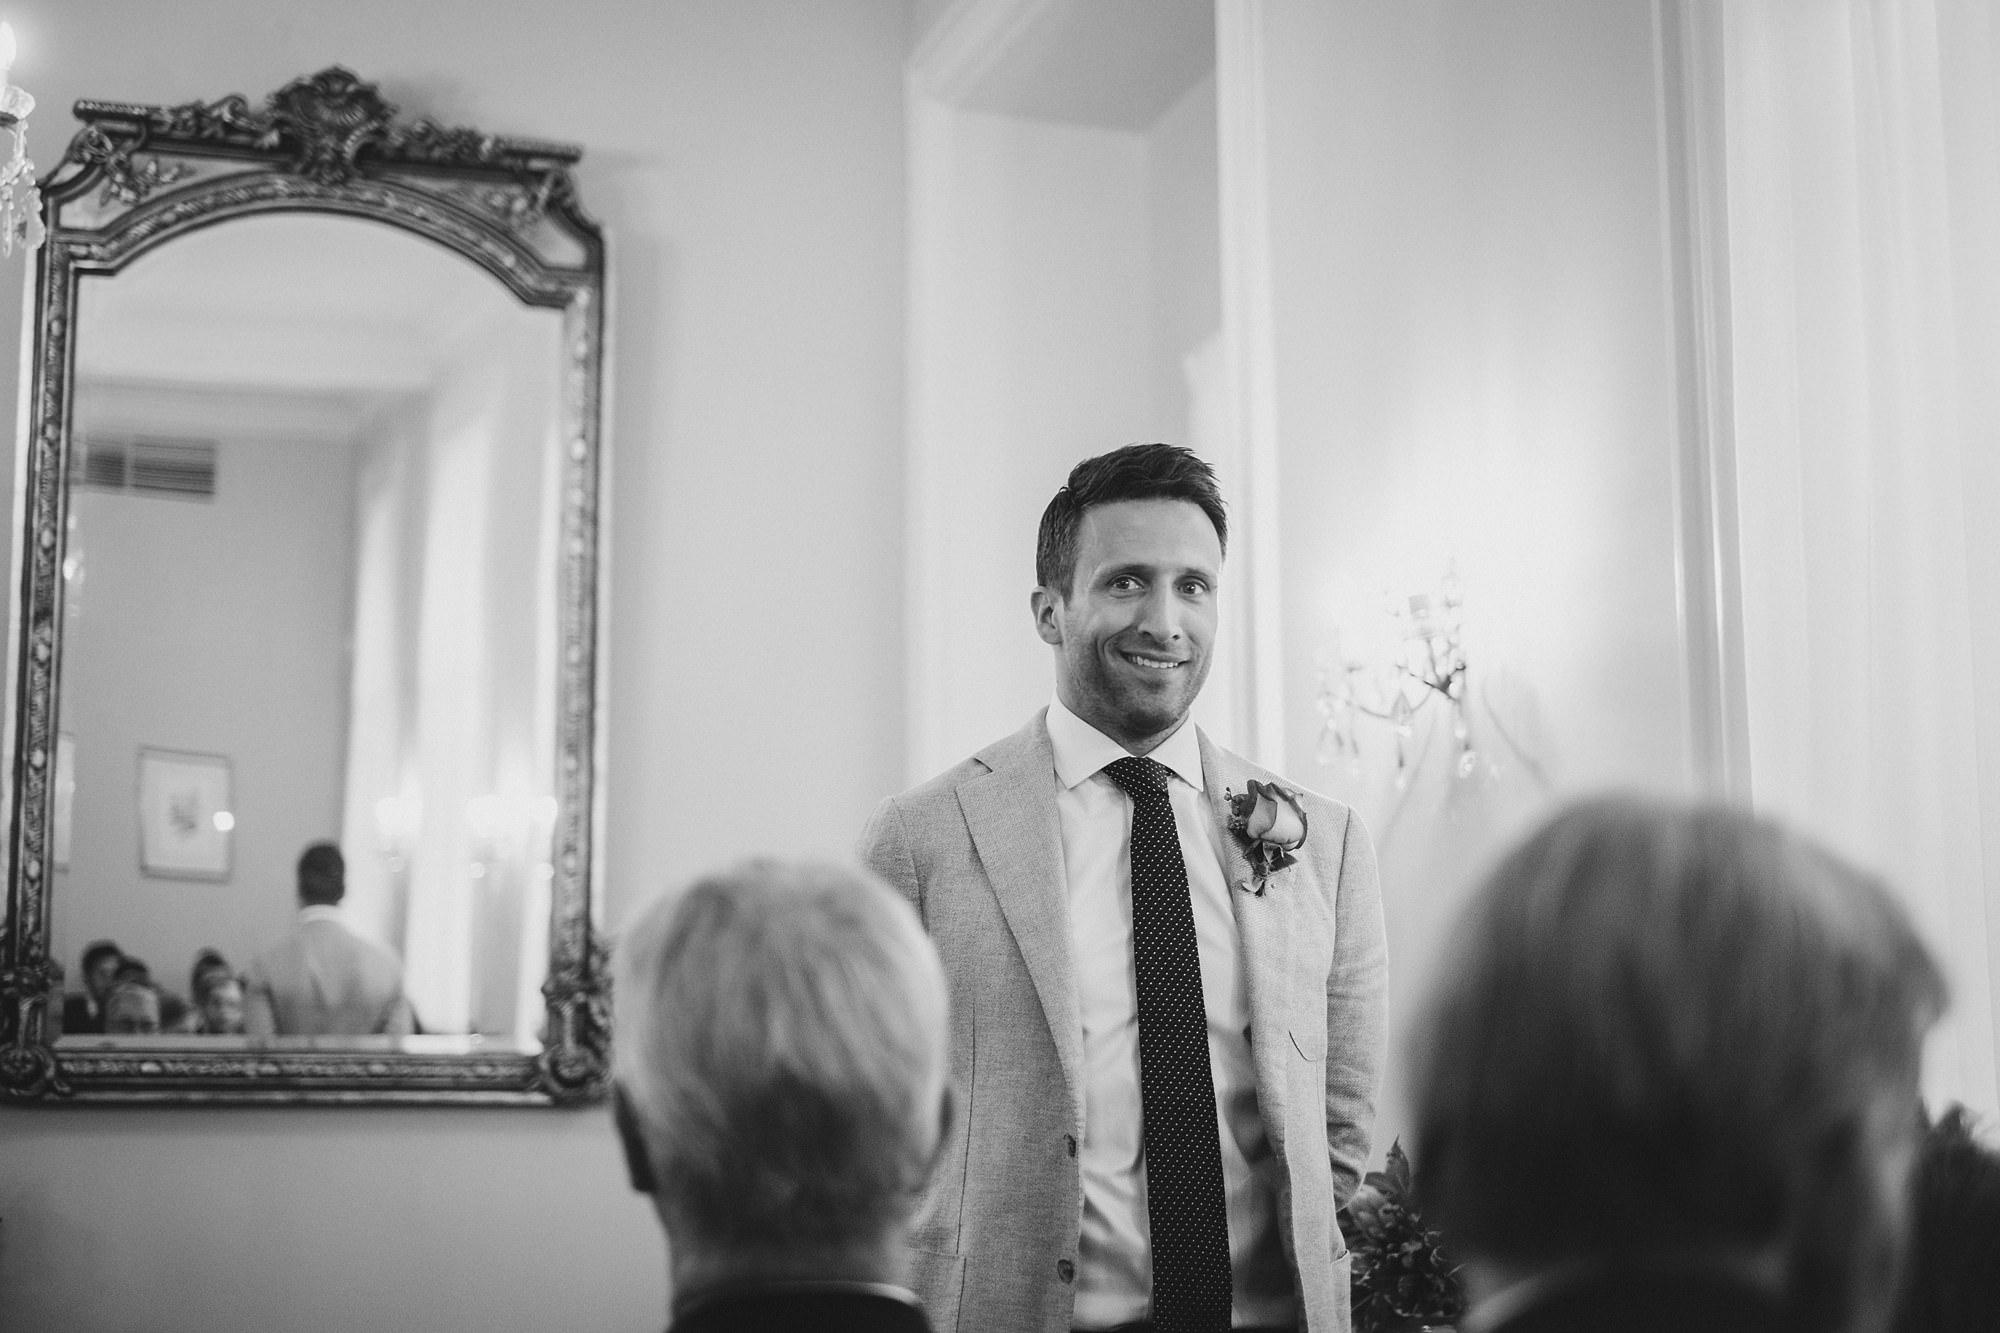 chelsea old town hall wedding photographer te 042 - Tara + Ed